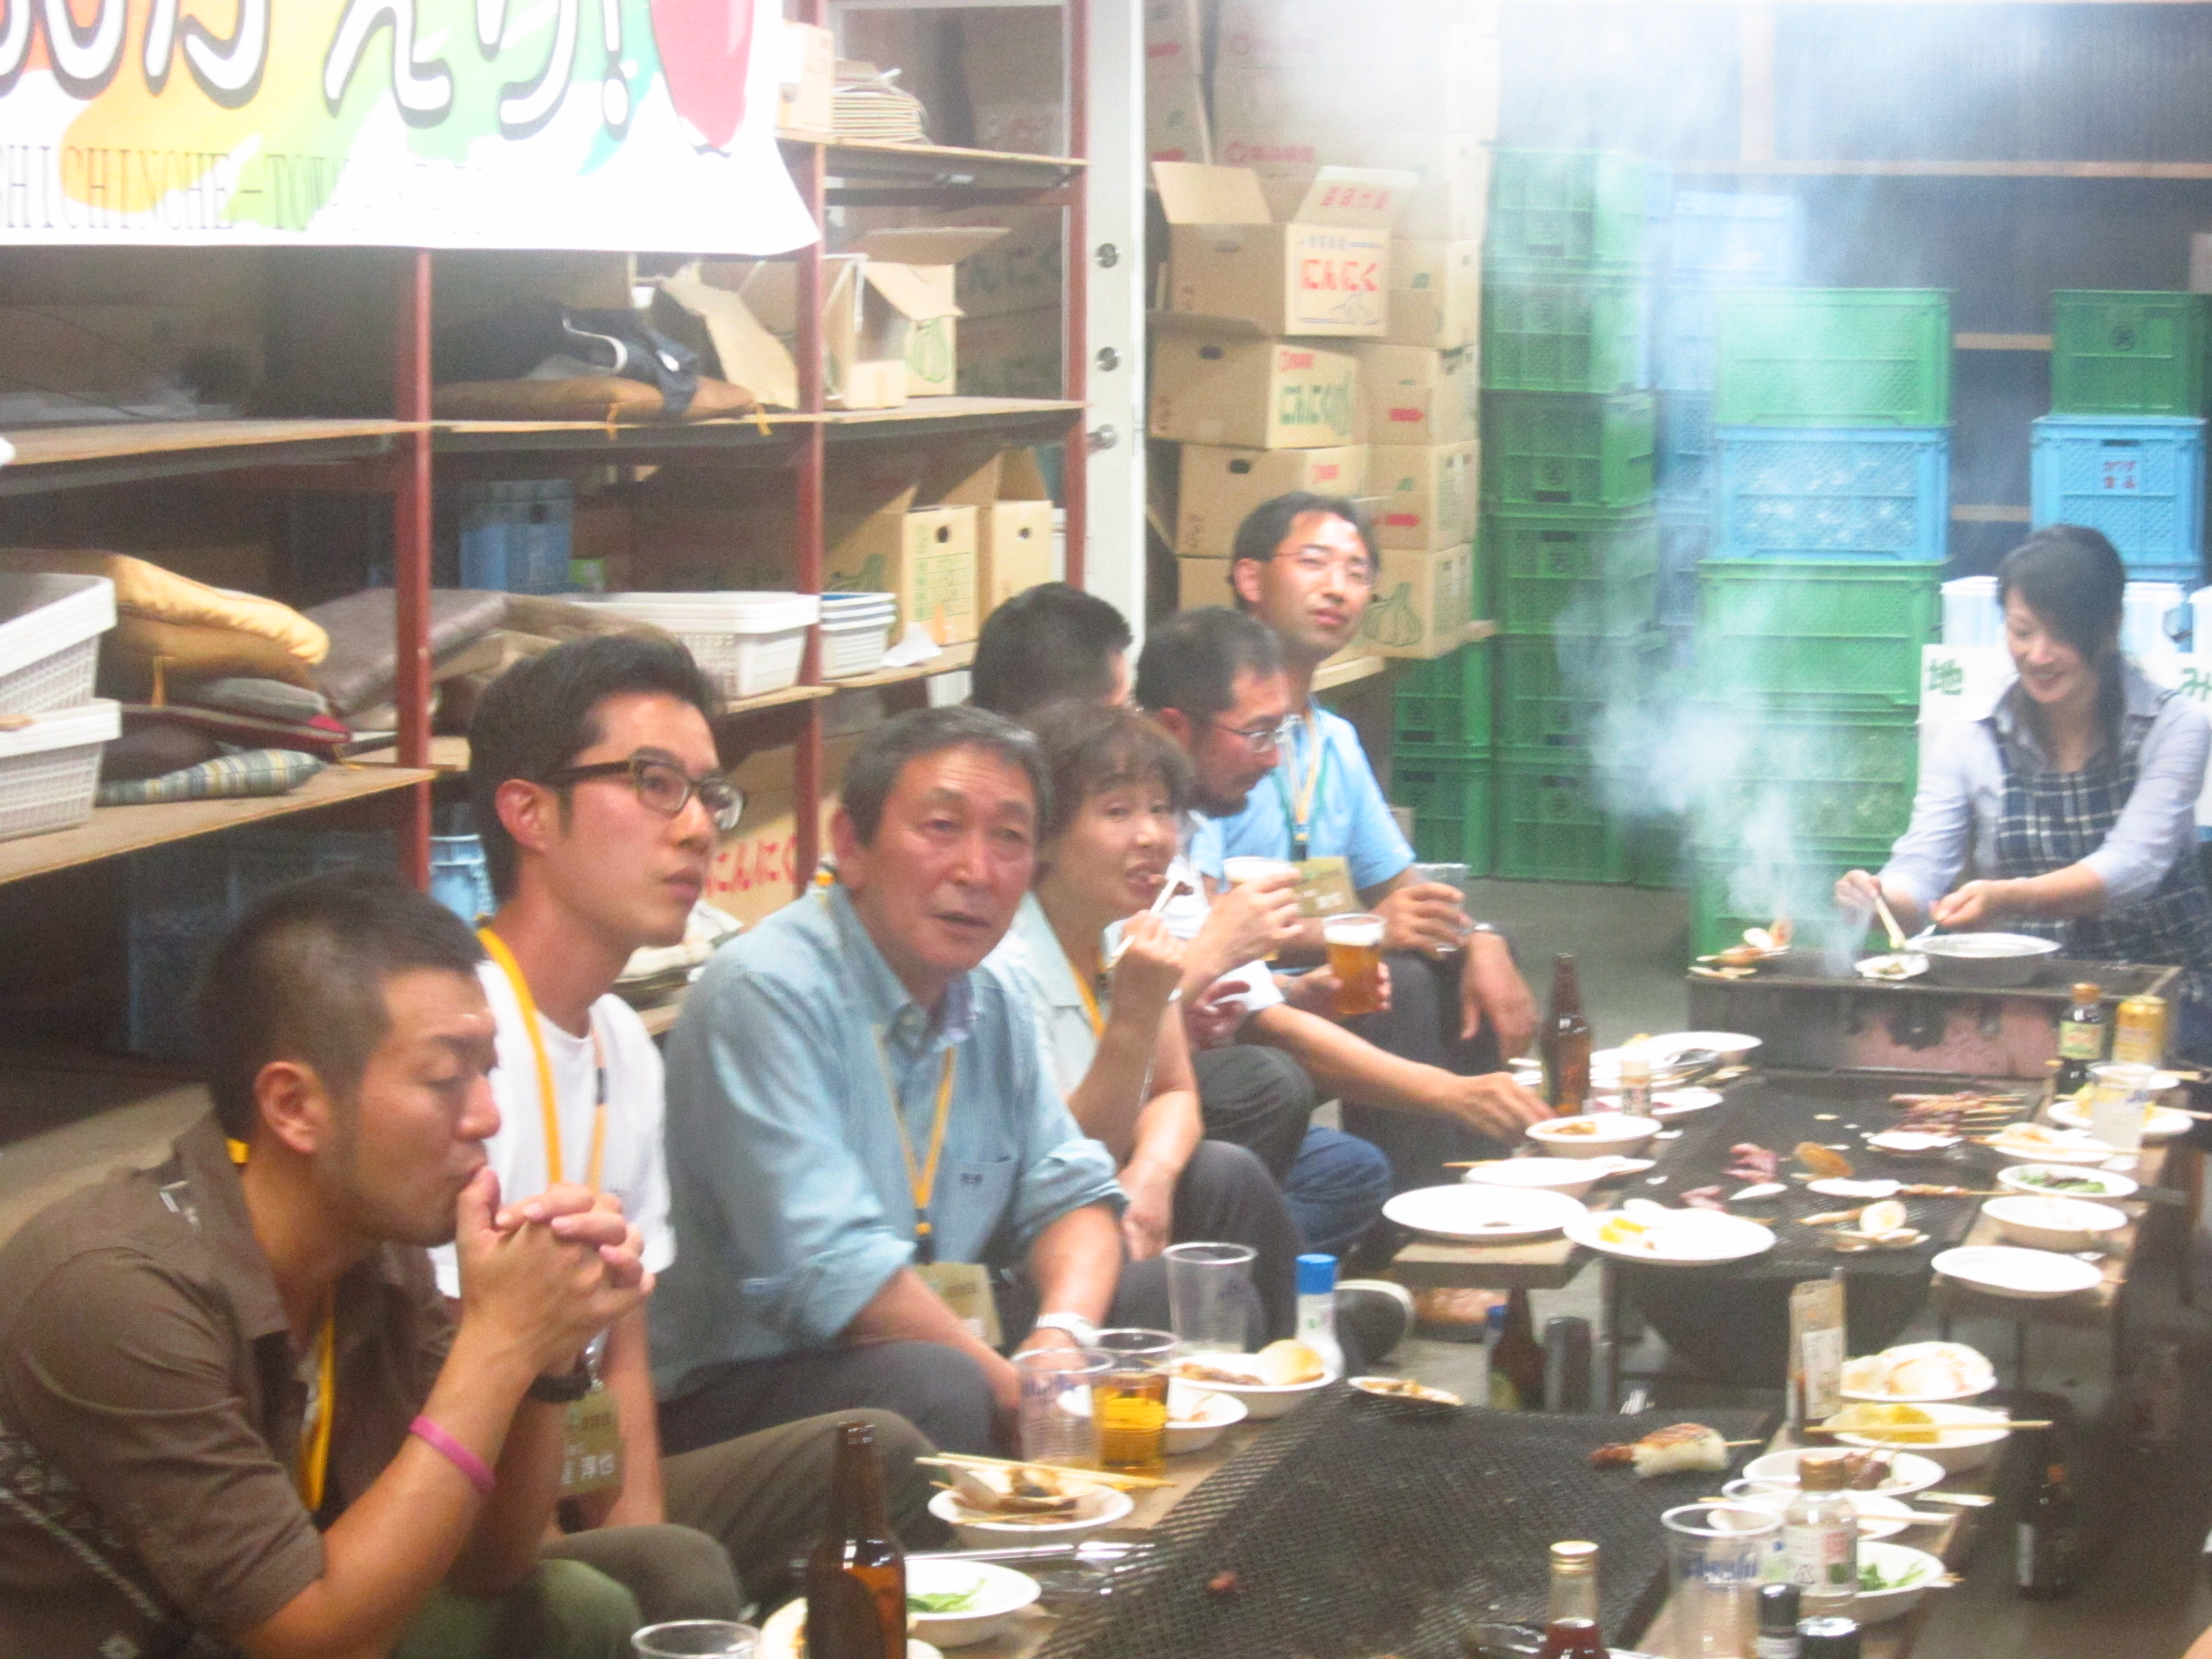 IMG 4343 - 麻布十番納涼祭り25,26日(七戸町出店)